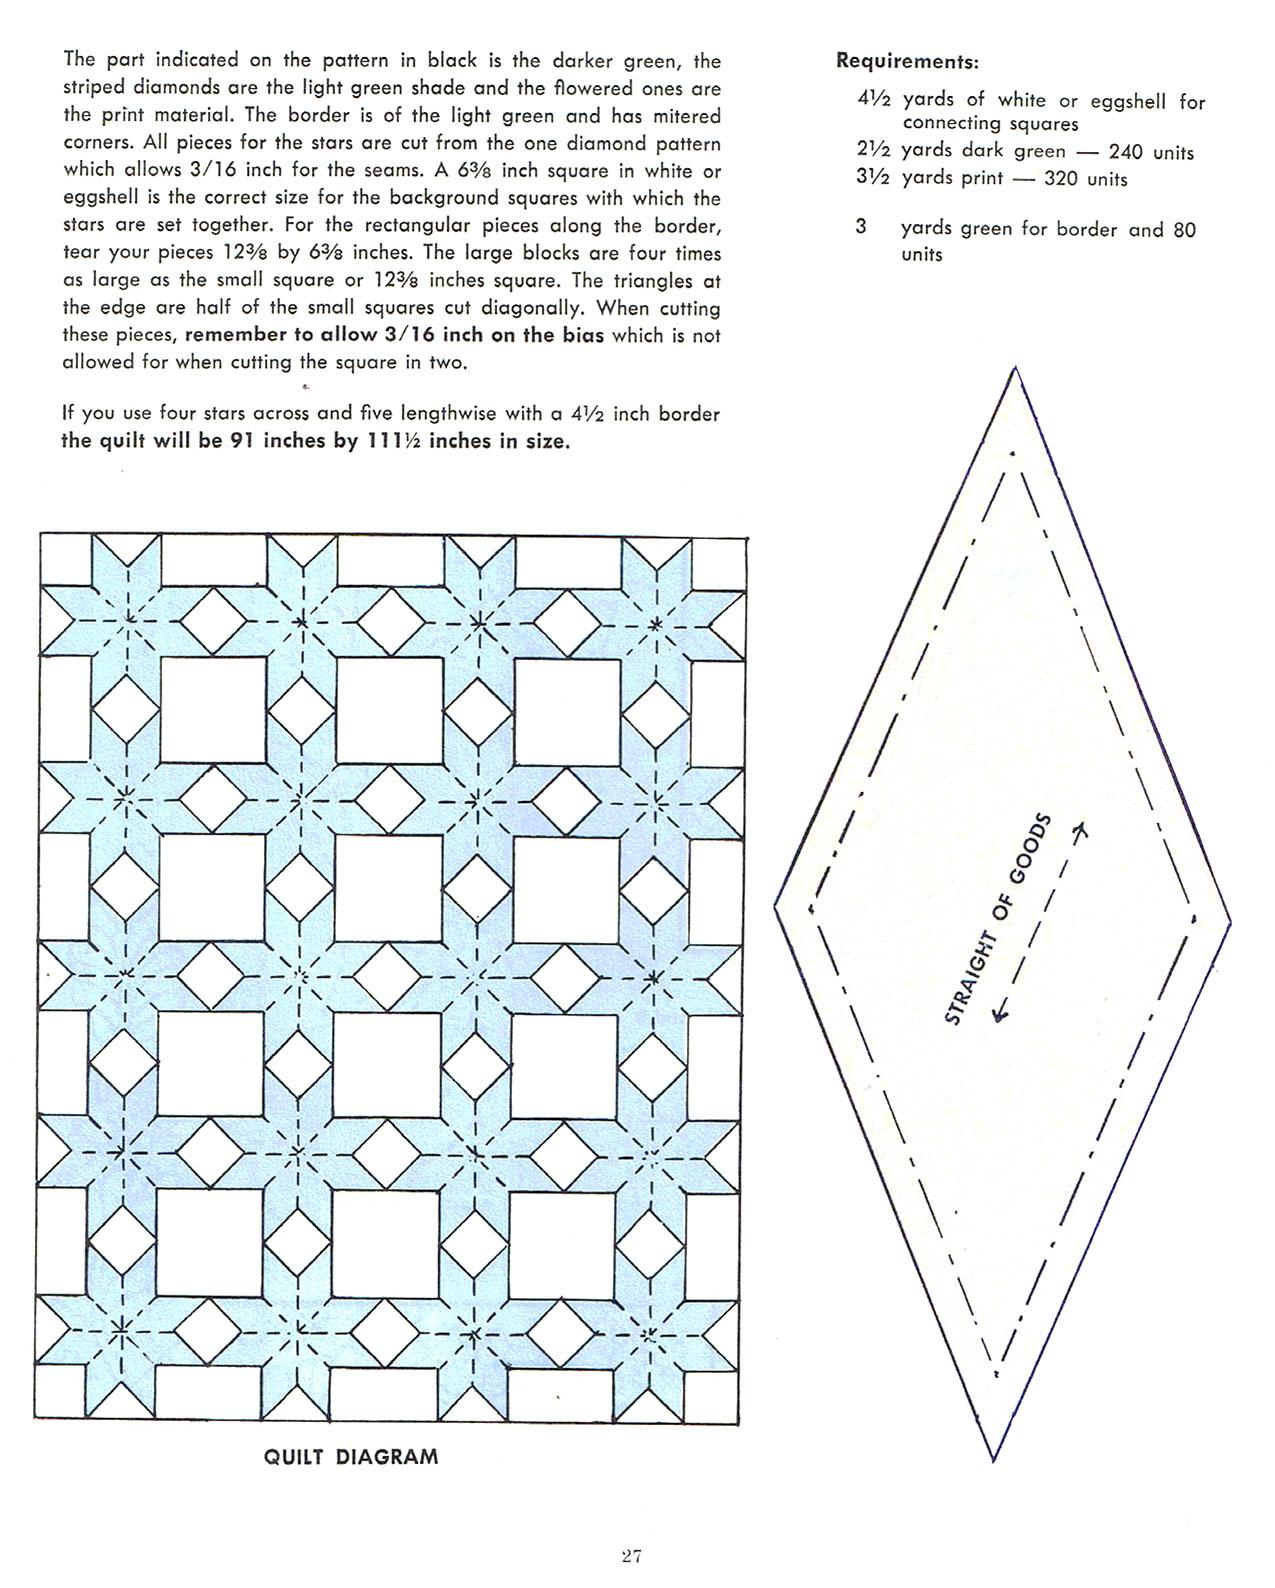 http://qisforquilter.com/wp-content/uploads/2012/11/Sixteen-Blue-Ribbon-Quilts-29.jpg